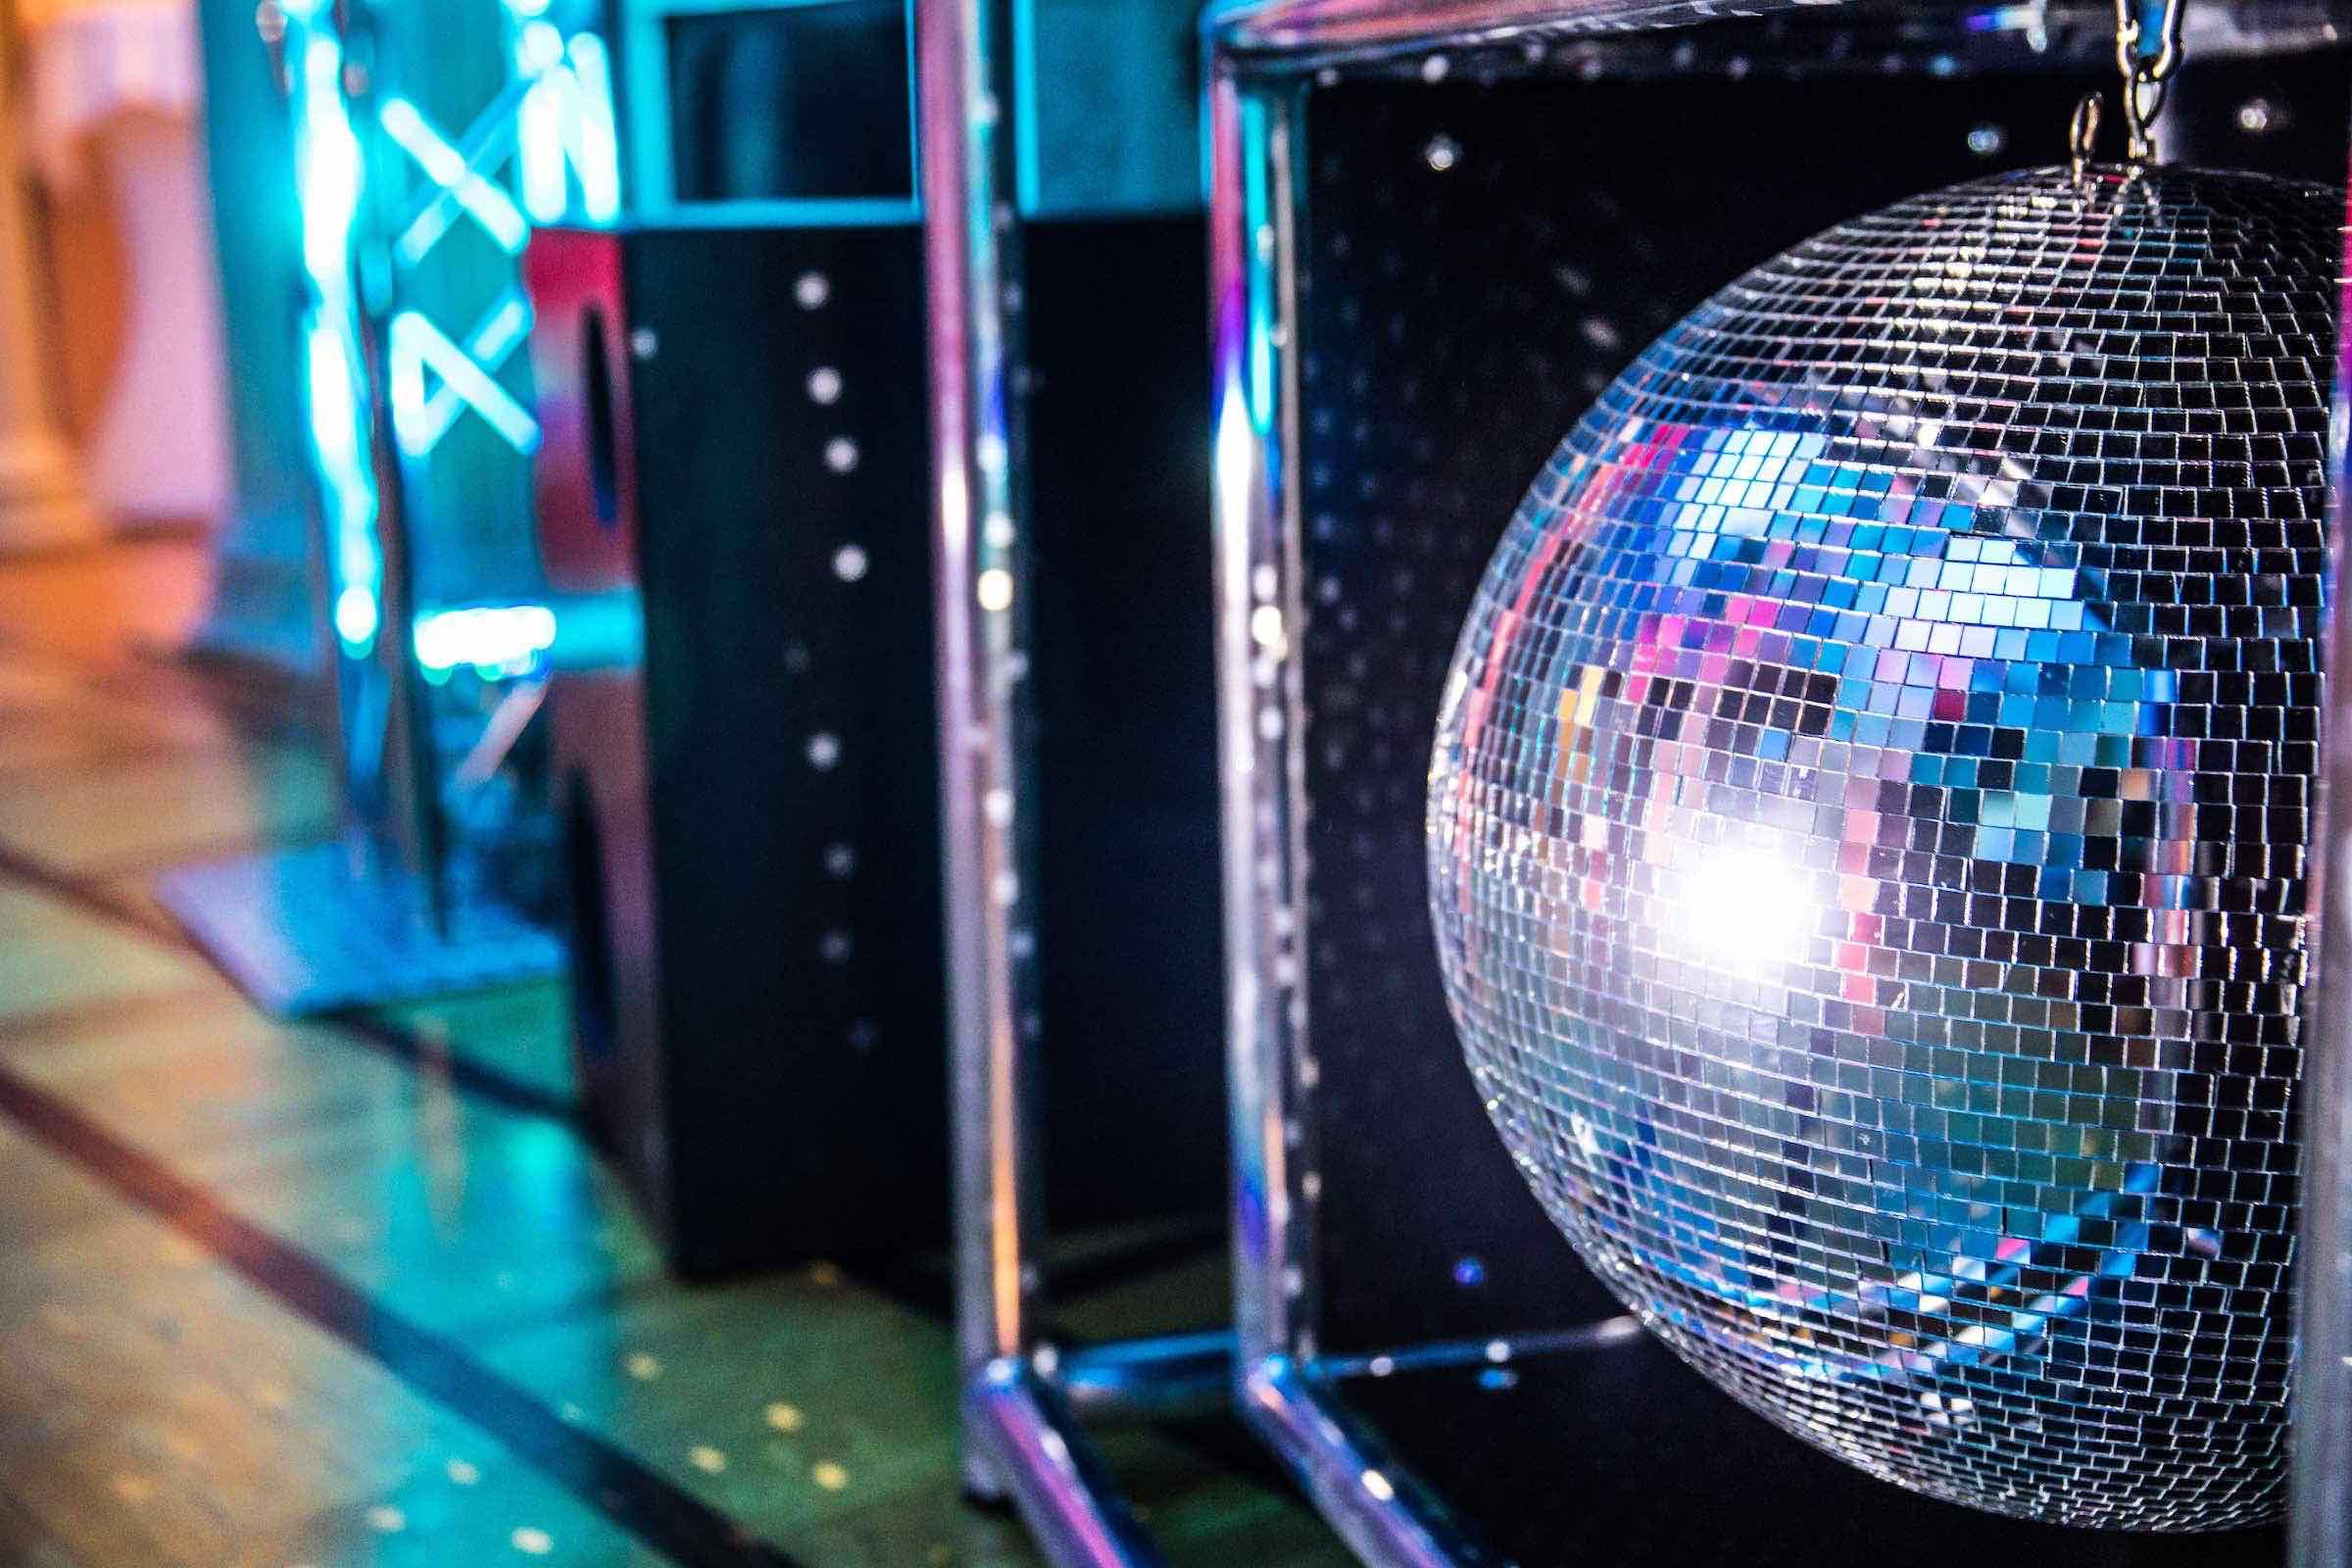 DJ | Technik | Hamburg | DJ | Service | DJ | Feier | Hochzeits | DJ | Messe | DJ | Firmenevent | Firmenfeier | DJ | Geburtstag | Discjockey | Weihnachtsfeier | DJ | Sommerfest | Event | Buchen | Mieten | Hamburgfeiert